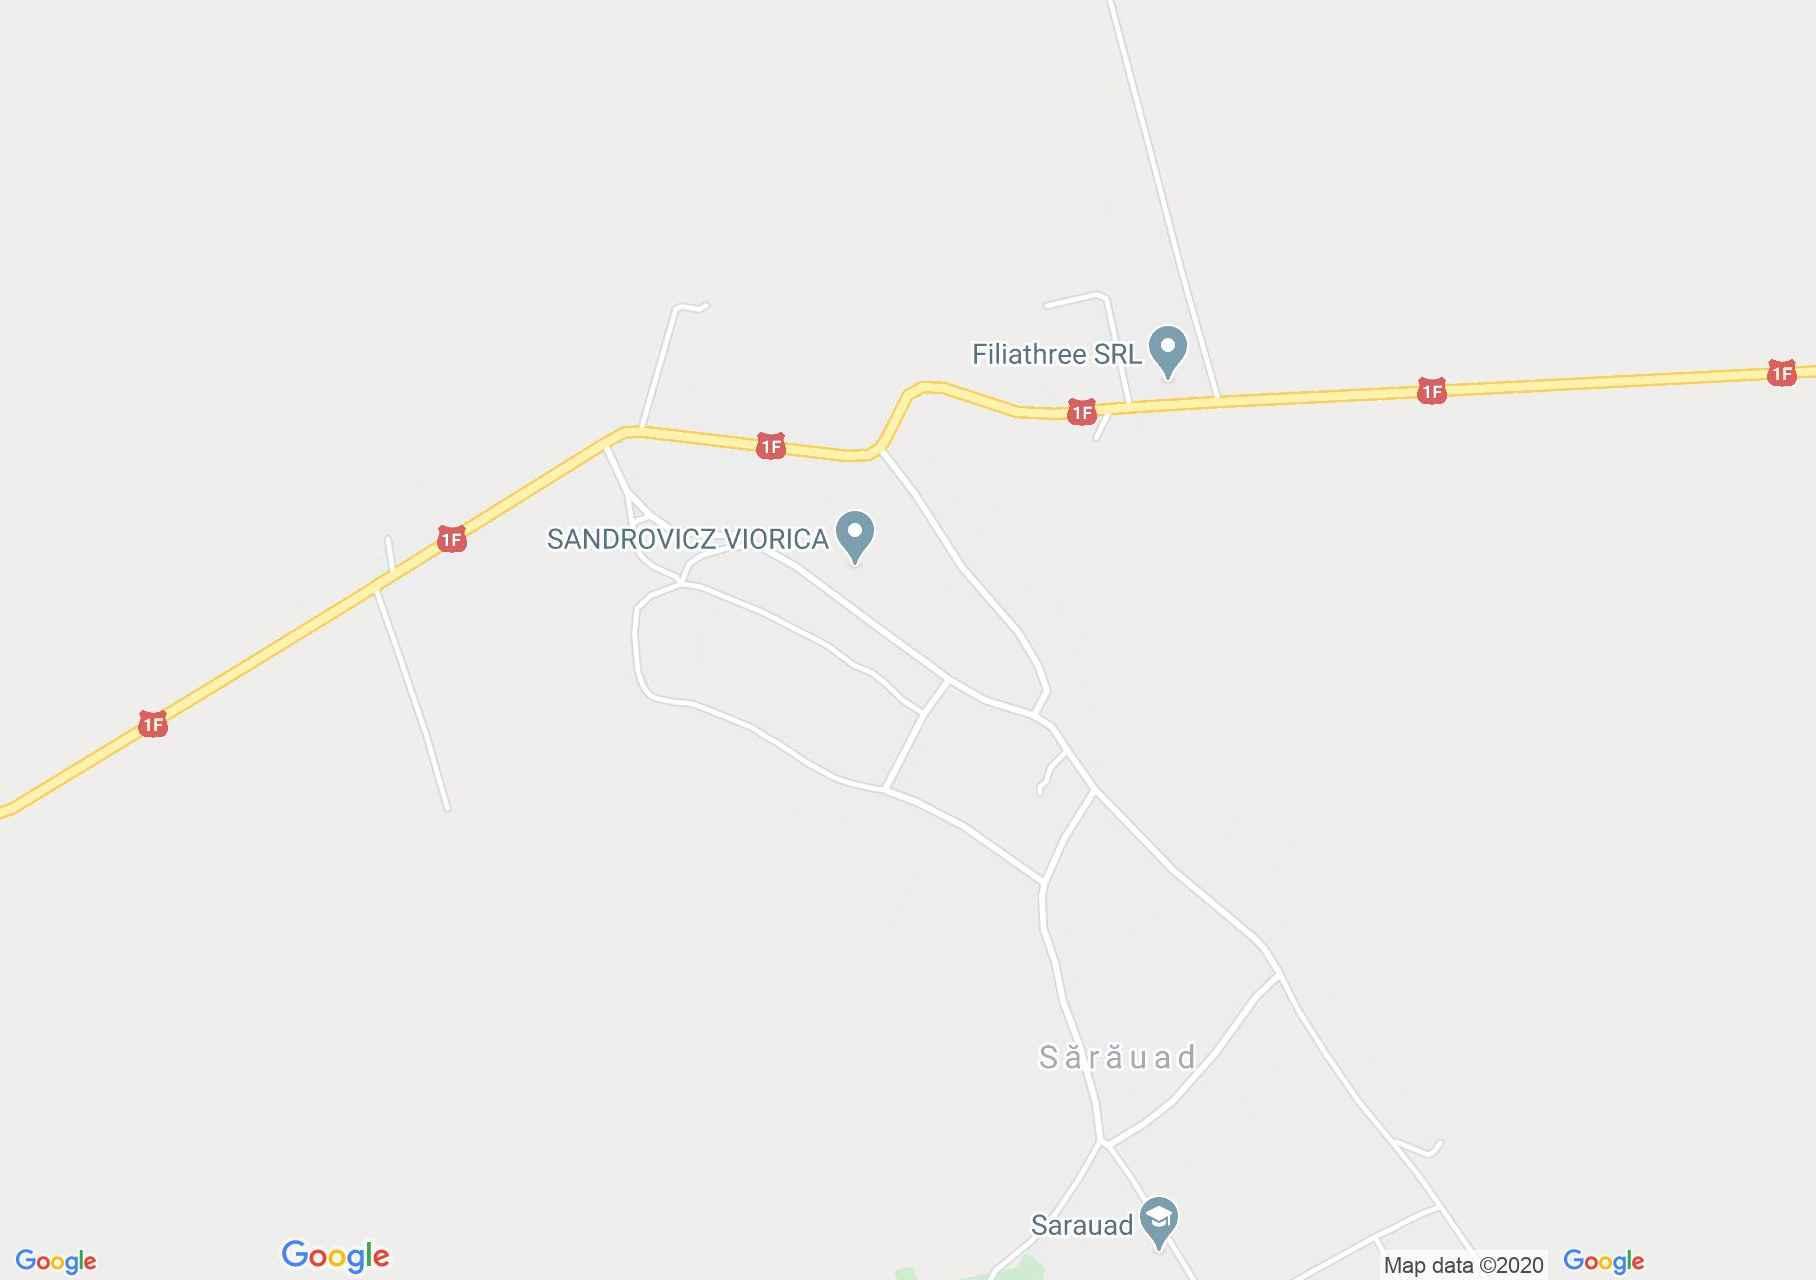 Tasnádszarvad interaktív turista térképe.